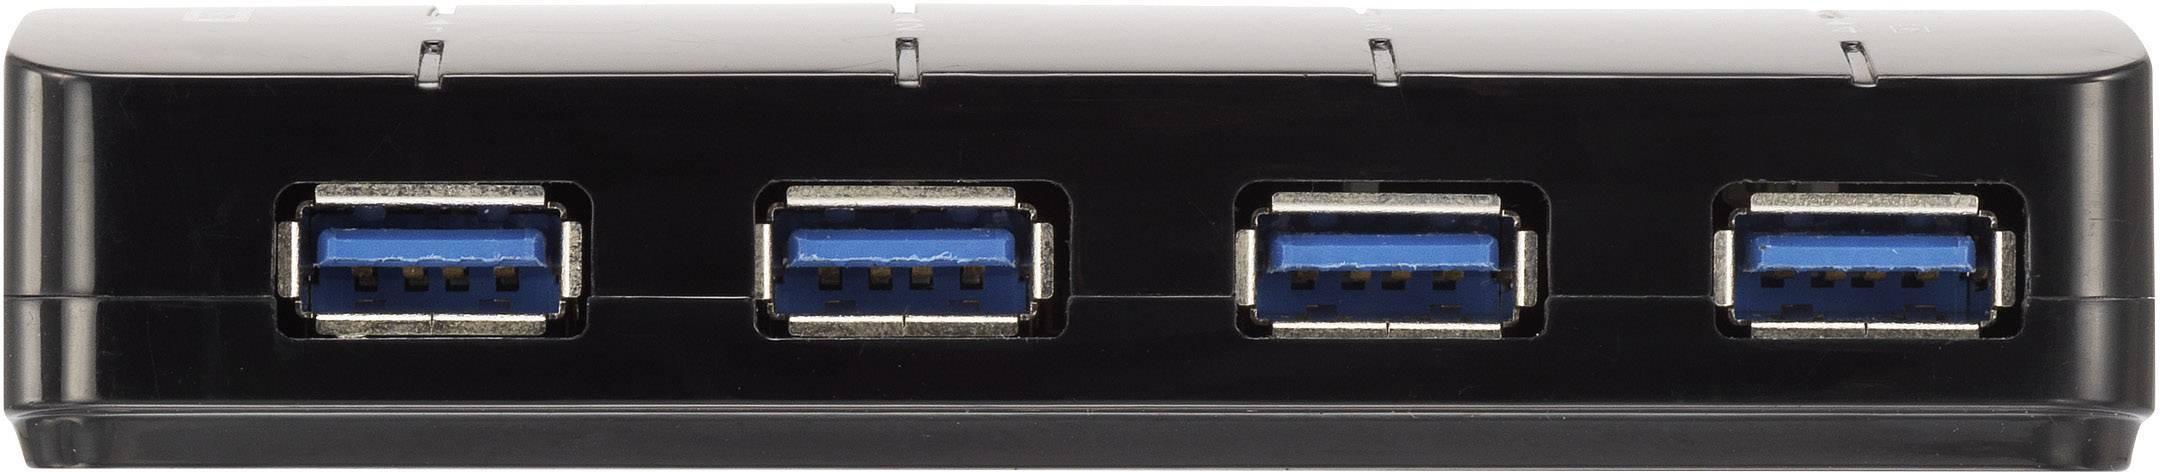 USB 3.0 hub Renkforce RF-3016752 4 porty, 105 mm, černá